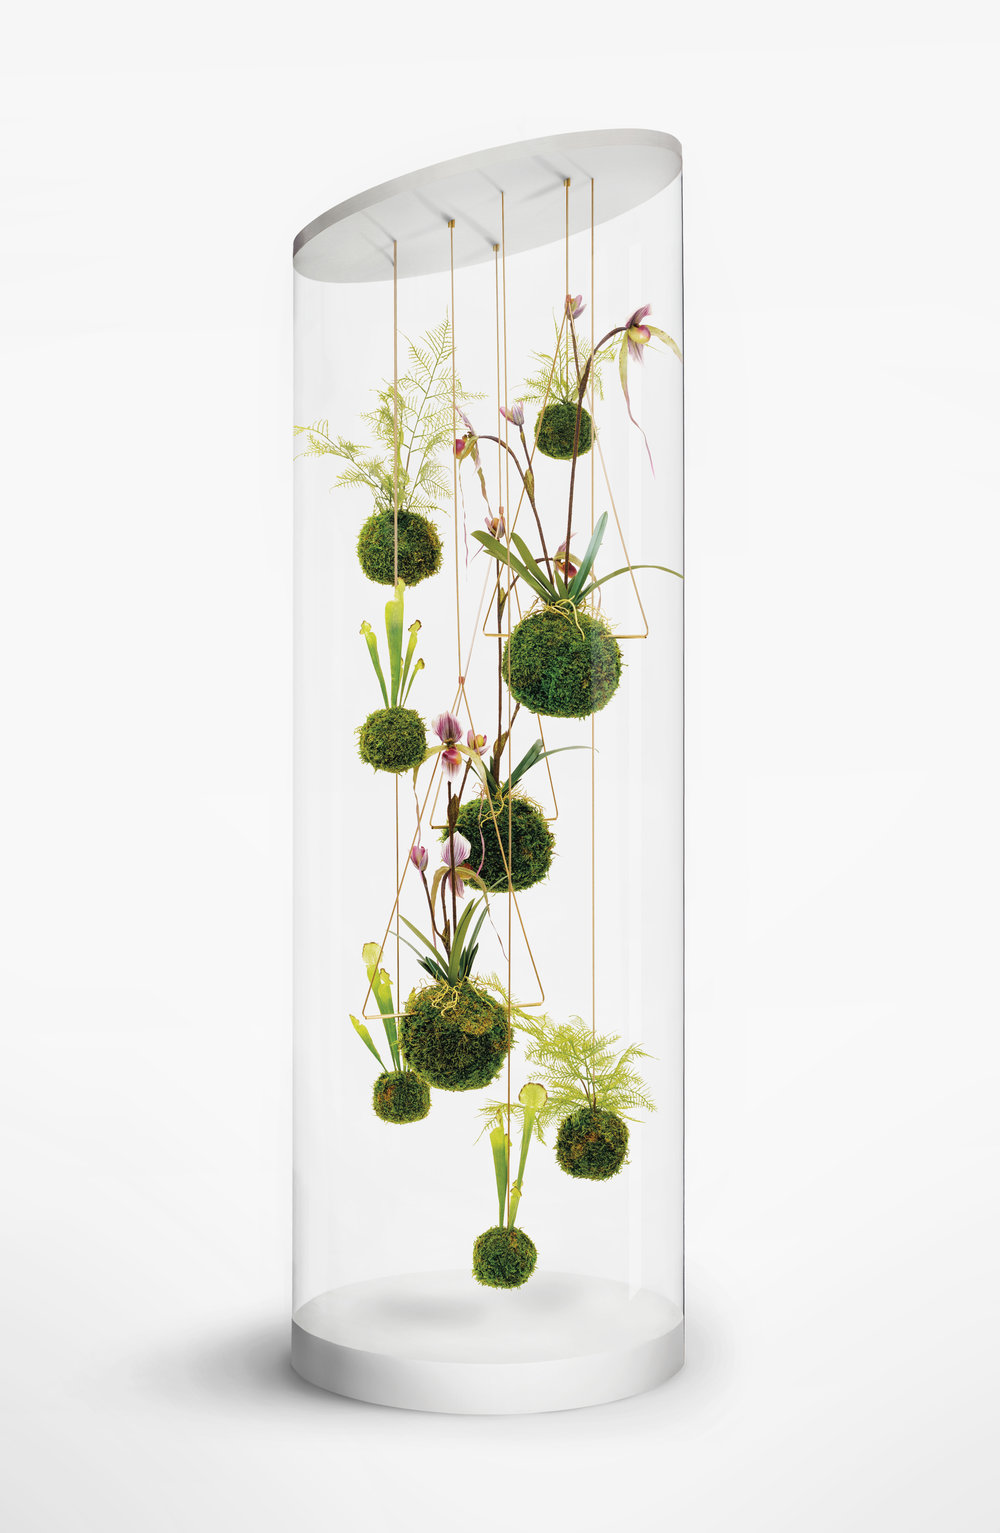 WeSmellTheRain-Installation-PlantCylinderCollection-HR-RGB-ƒ-smler.jpg